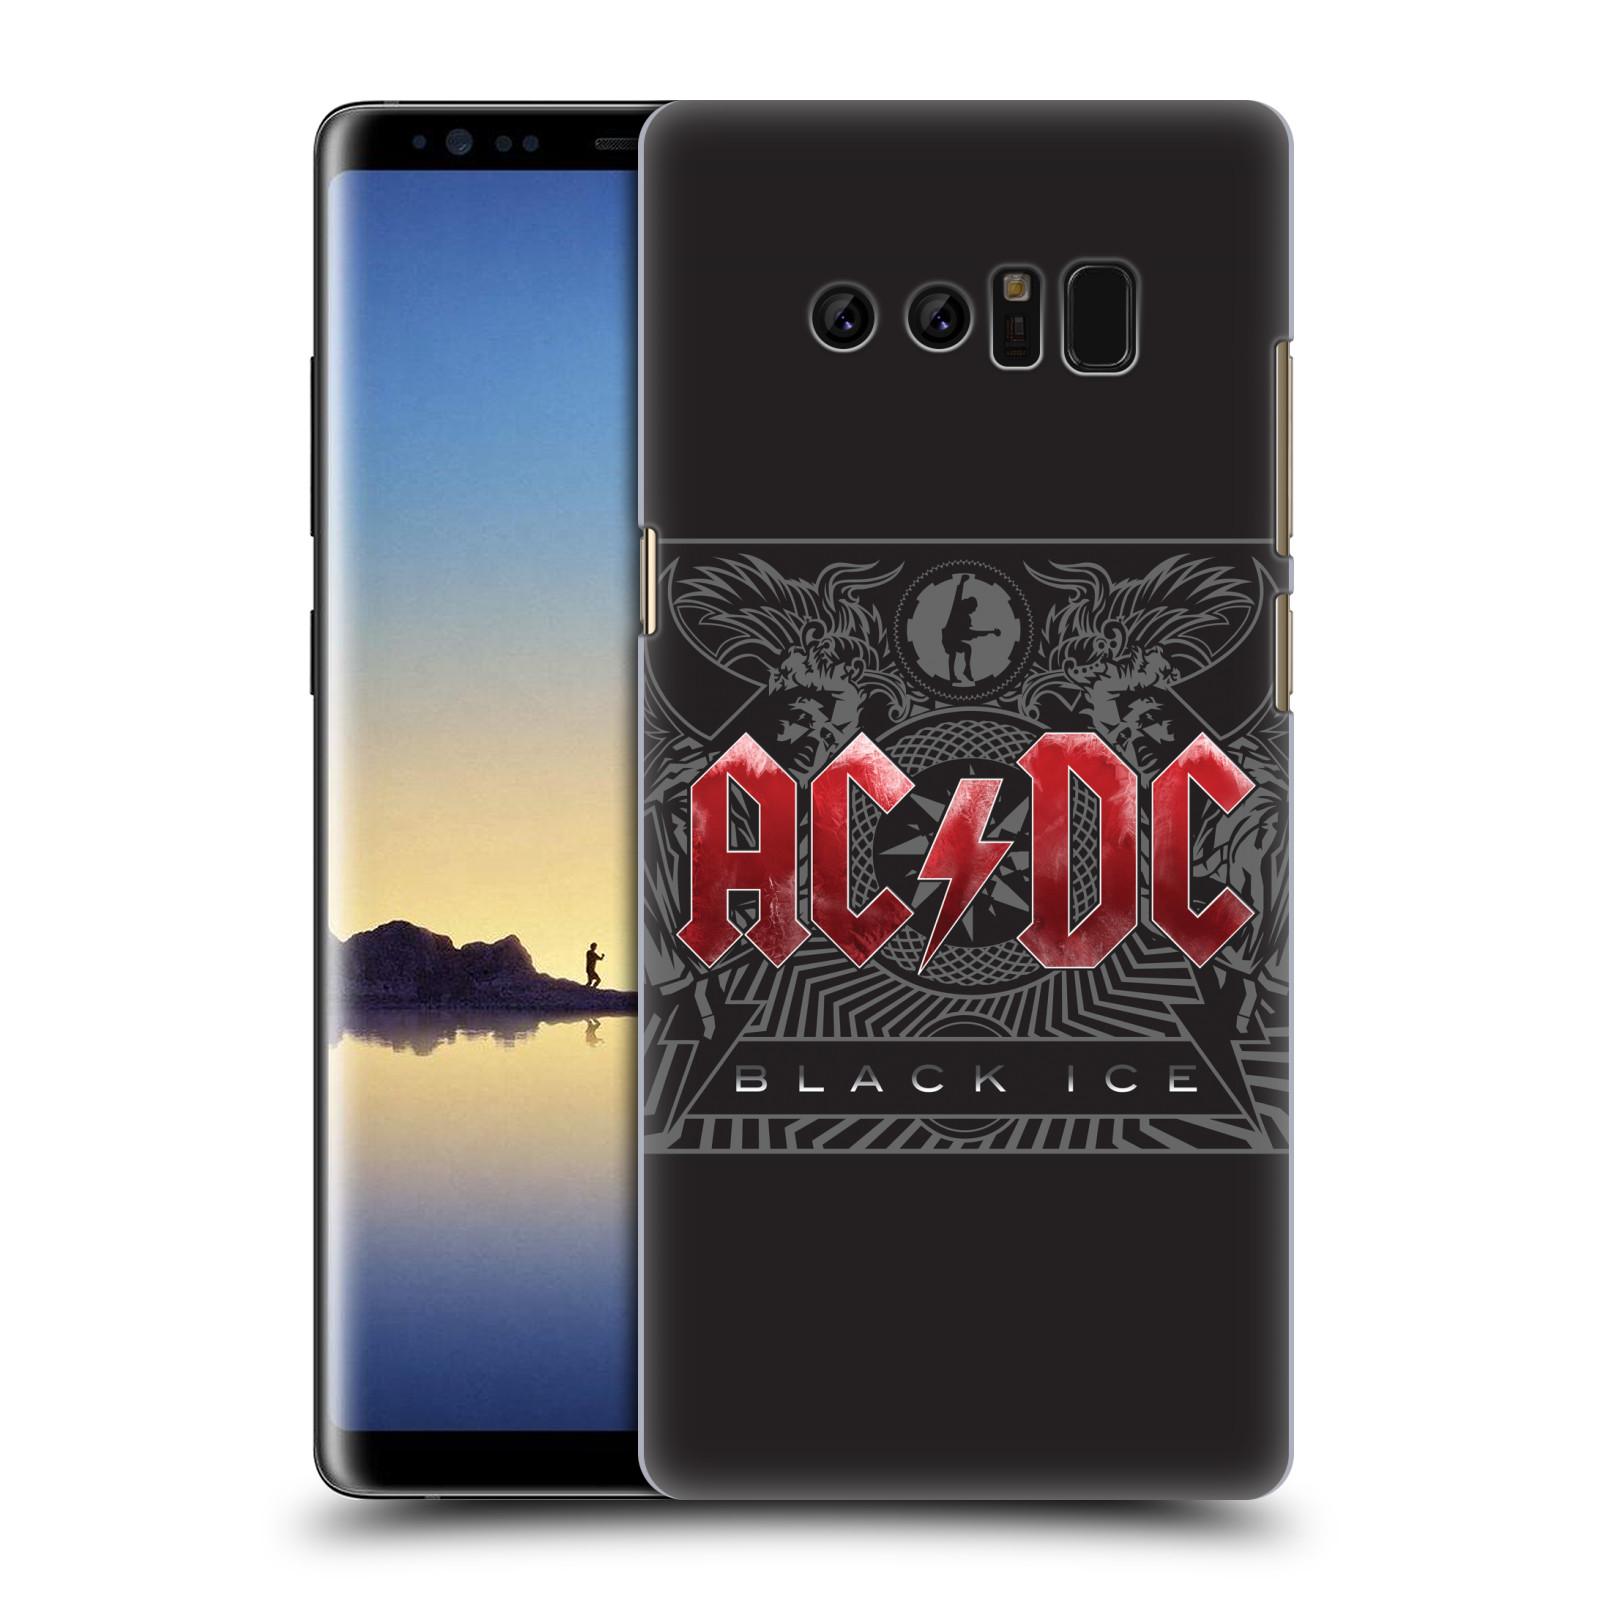 Plastové pouzdro na mobil Samsung Galaxy Note 8 - Head Case - AC/DC Black Ice (Plastový kryt či obal na mobilní telefon Samsung Galaxy Note 8 SM-N950 s motivem AC/DC Black Ice)